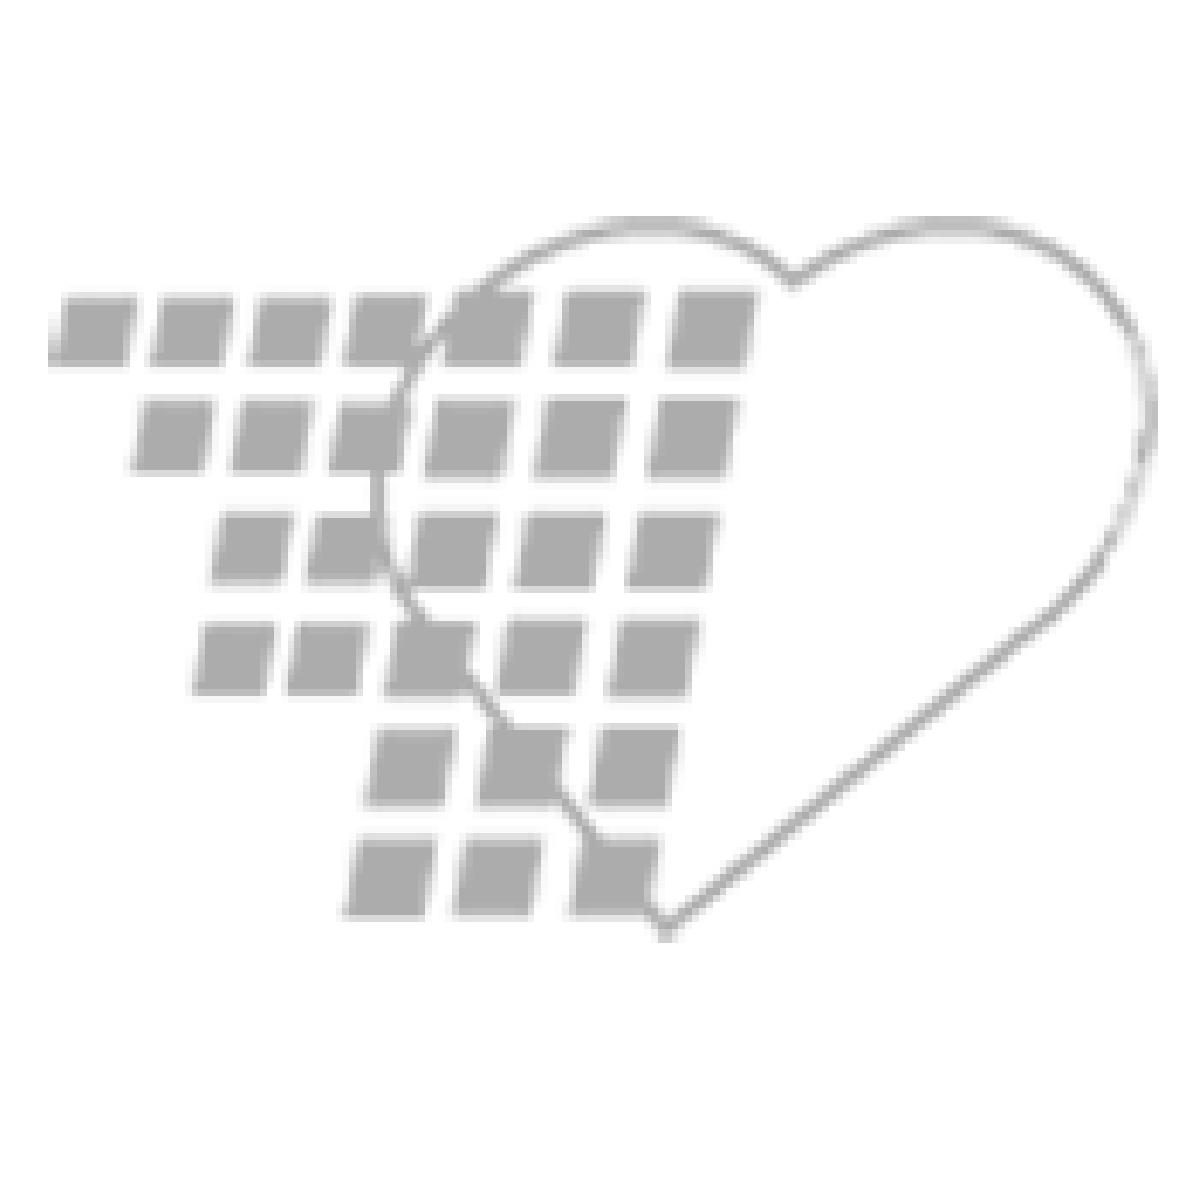 06-93-6958 - Demo Dose® Norepineprhrin Bitarate (Levophd) 4 mg/ 4 mL (1 mg/mL)